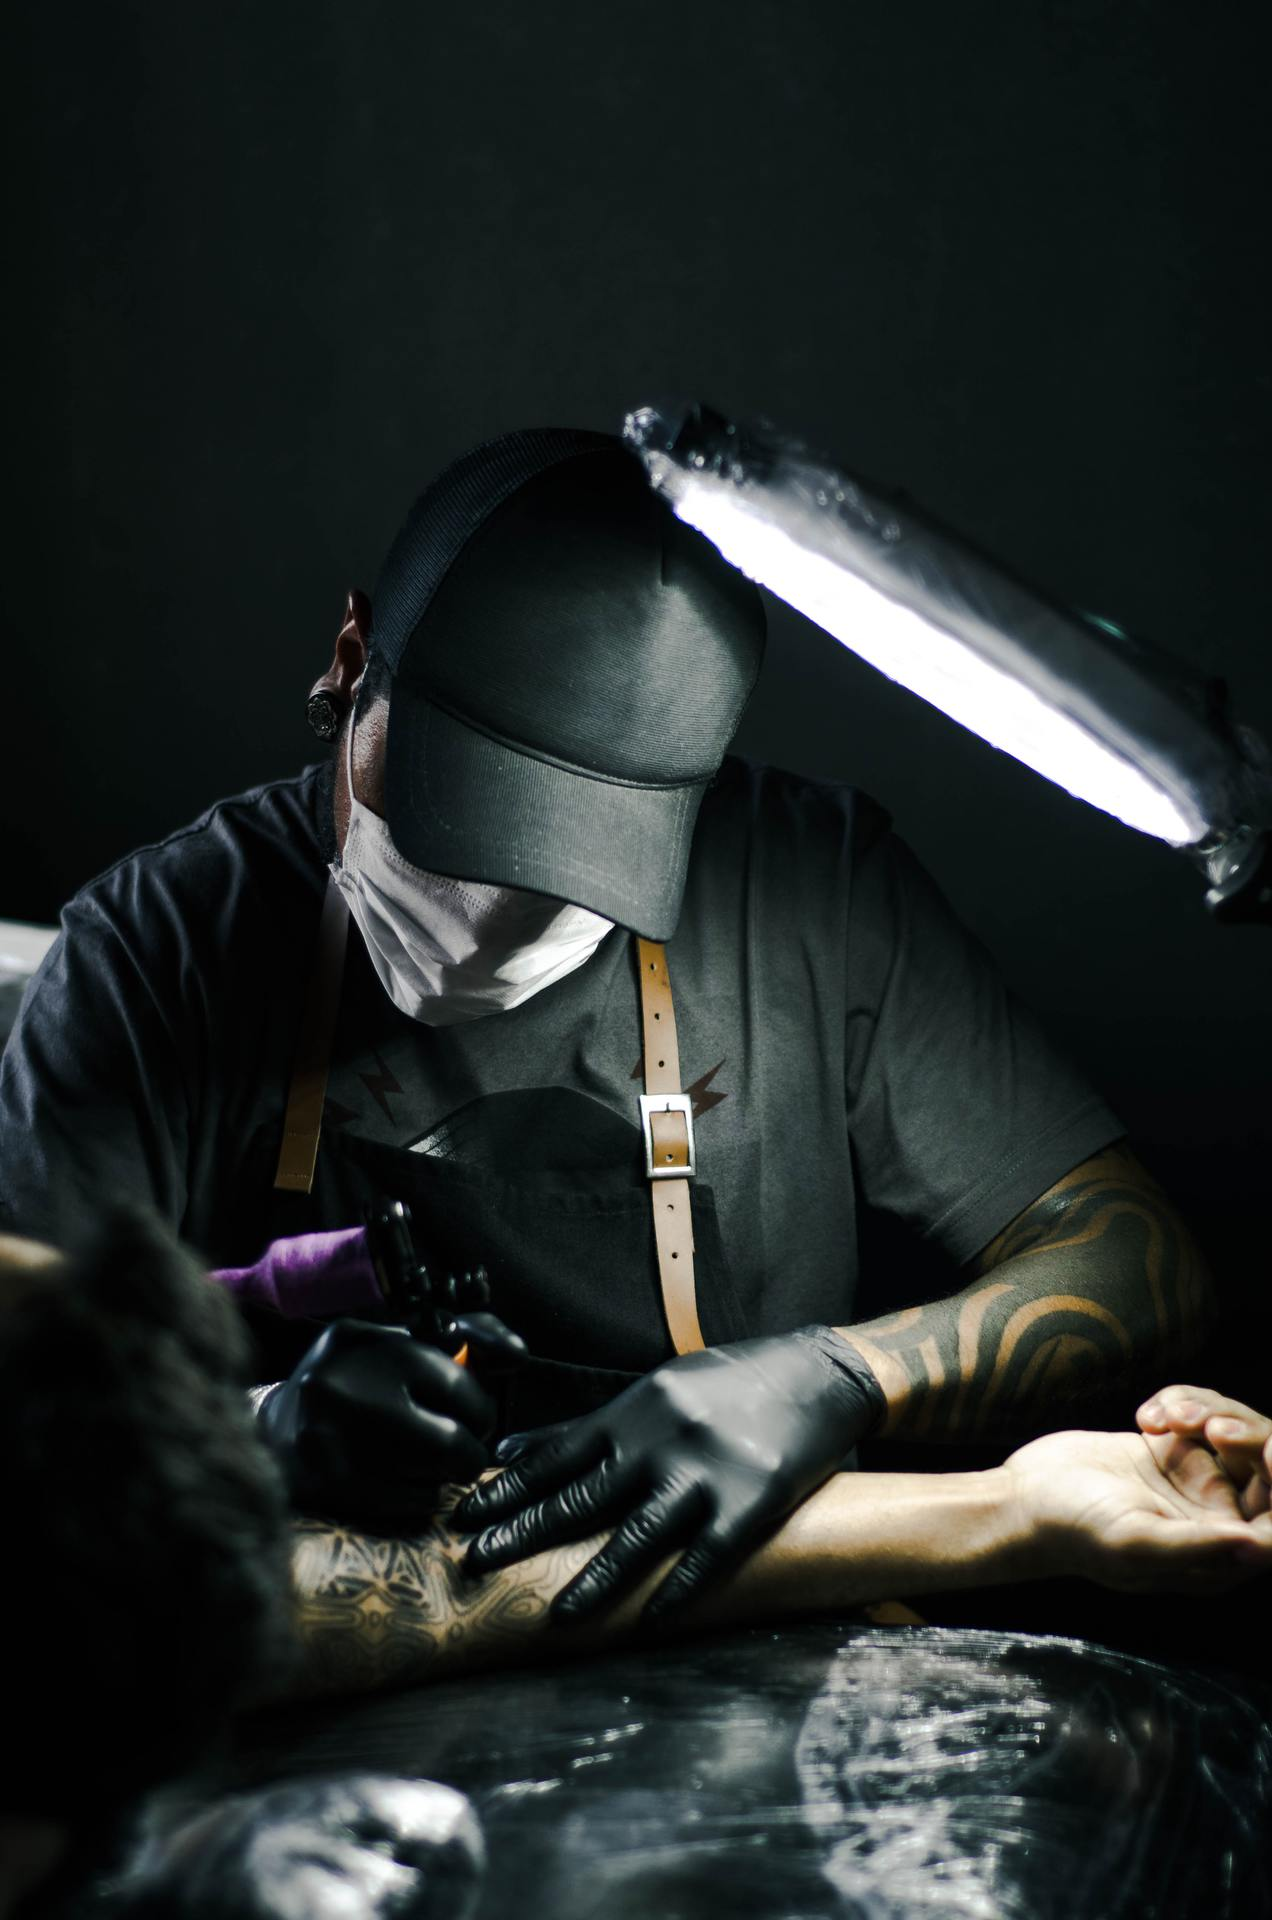 Praca tatuatora od zaplecza